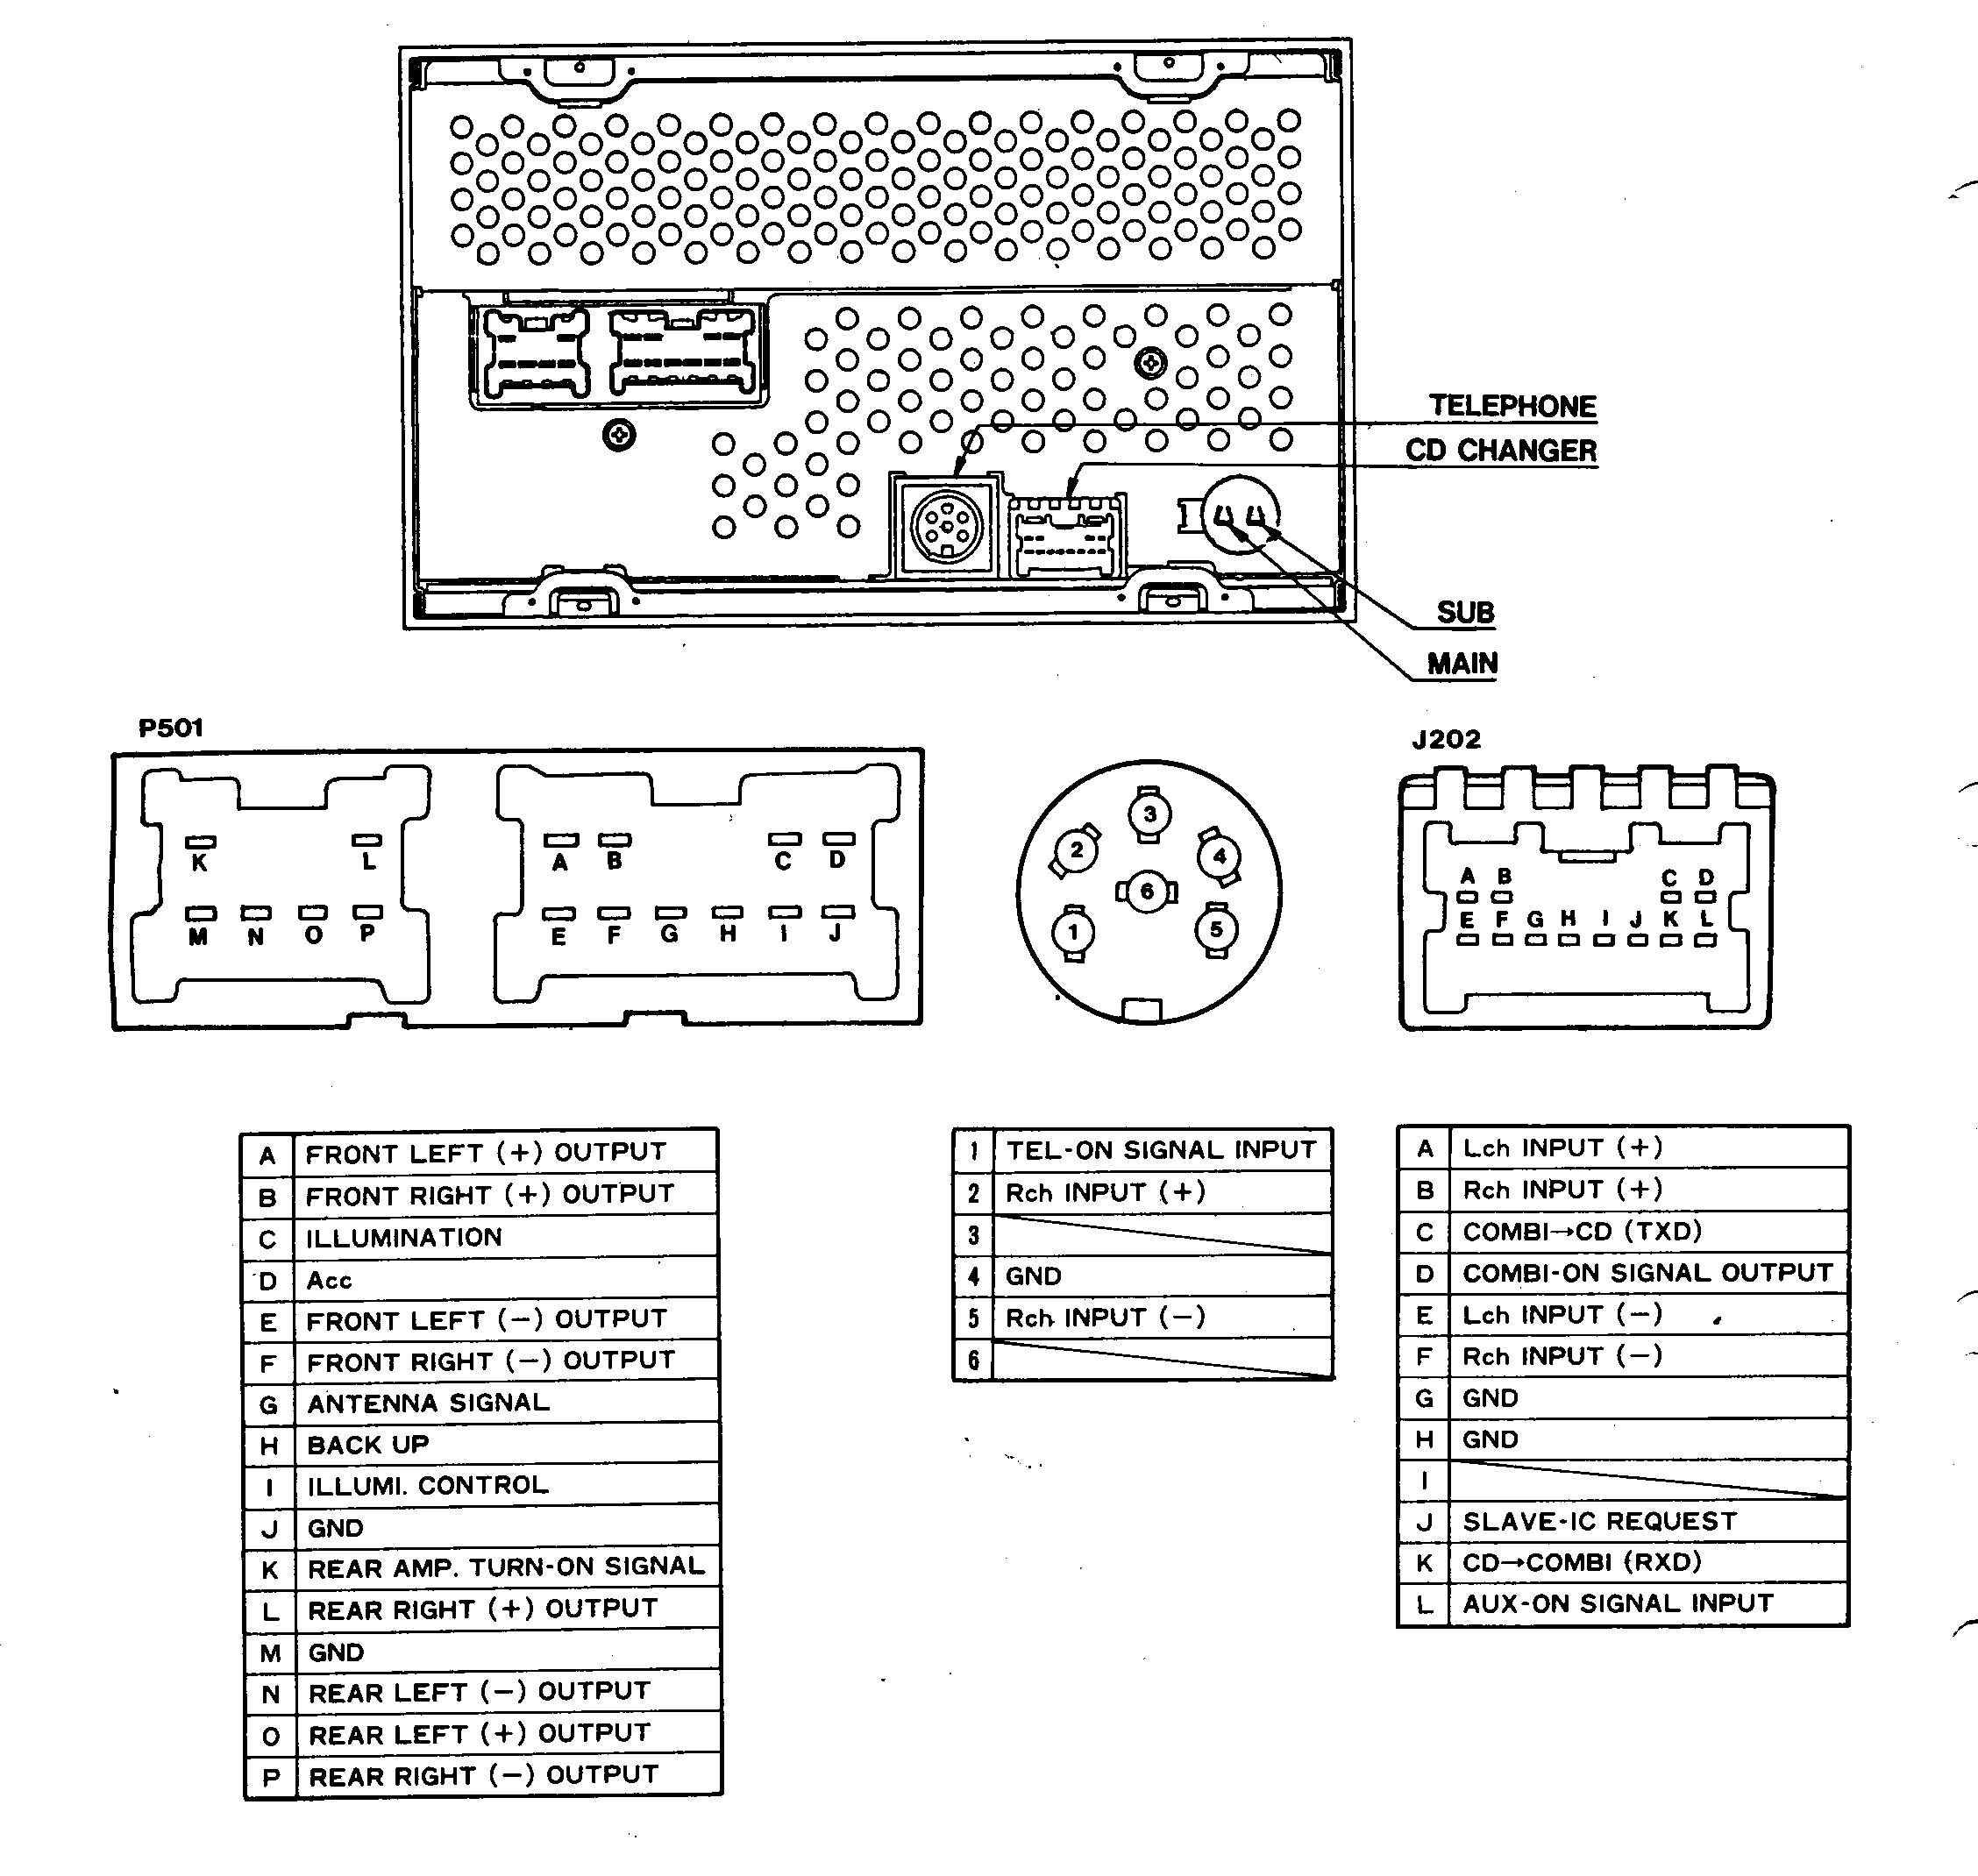 1994 Nissan Pathfinder Radio Wiring Diagram from tehnomagazin.com